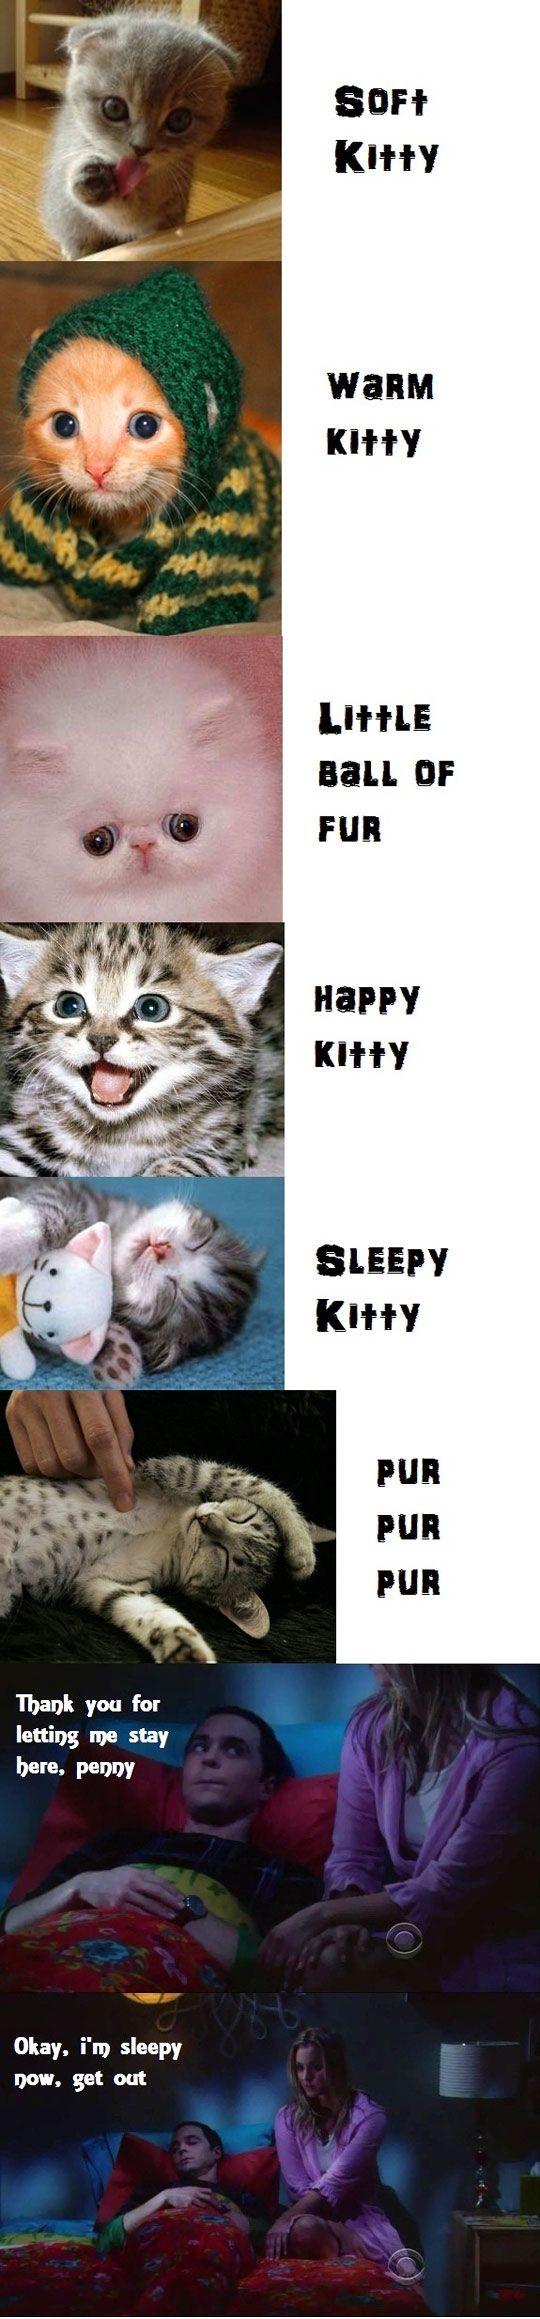 love big bang theory: Soft Kitty, Warm Kitty, Cat, Bigbangtheori, Big Bang Theory, Big Bangs Theory, Funny, Kittens, Kitty Songs